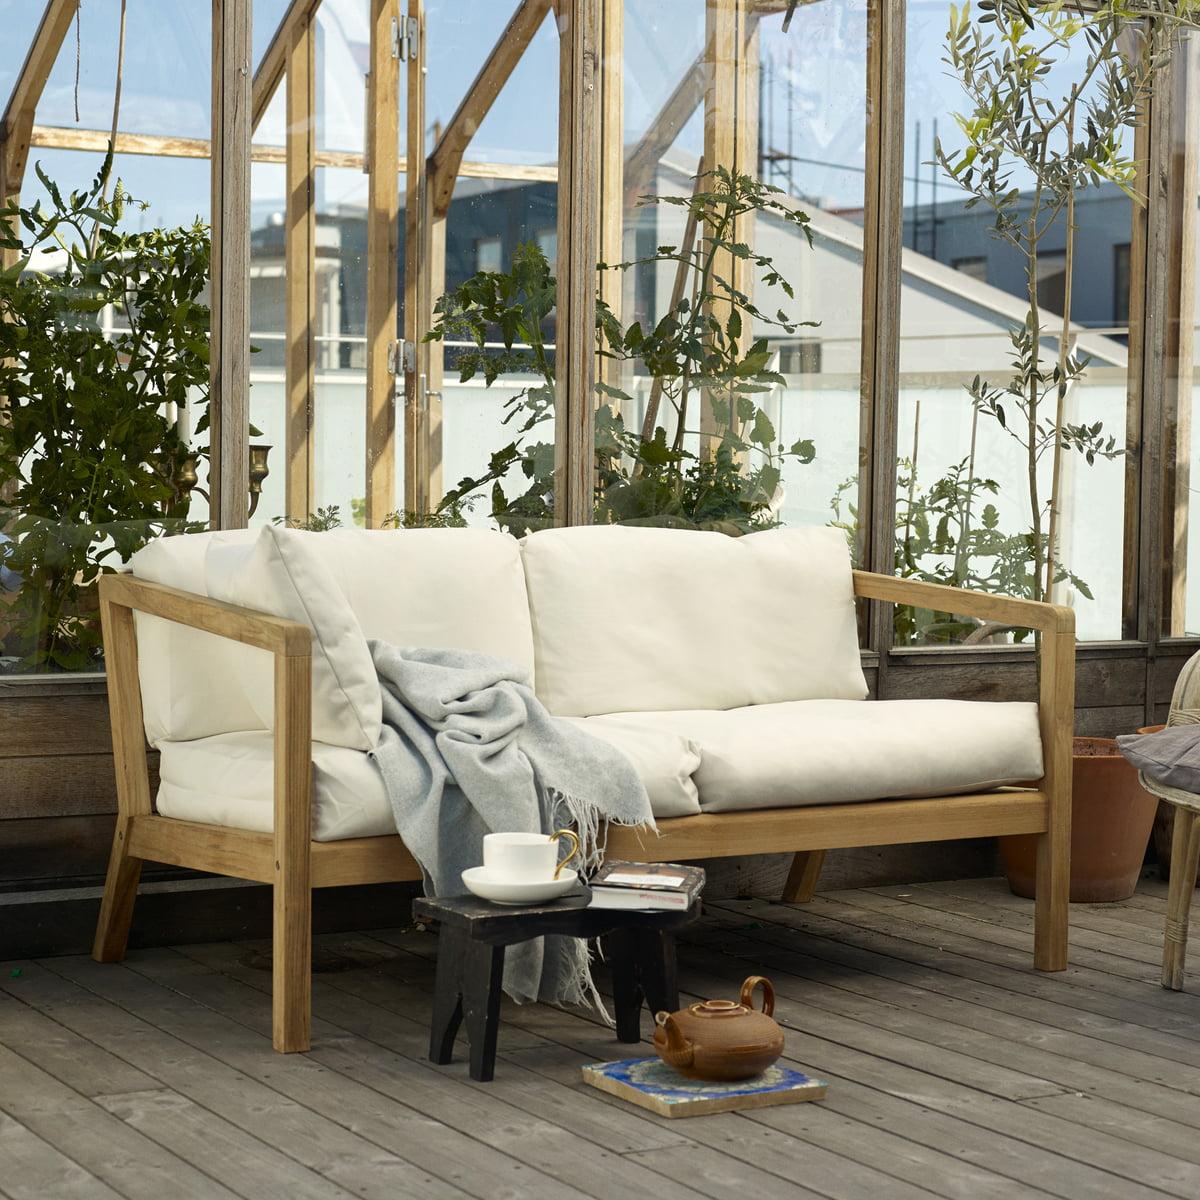 virkelyst sofa von skagerak im shop. Black Bedroom Furniture Sets. Home Design Ideas